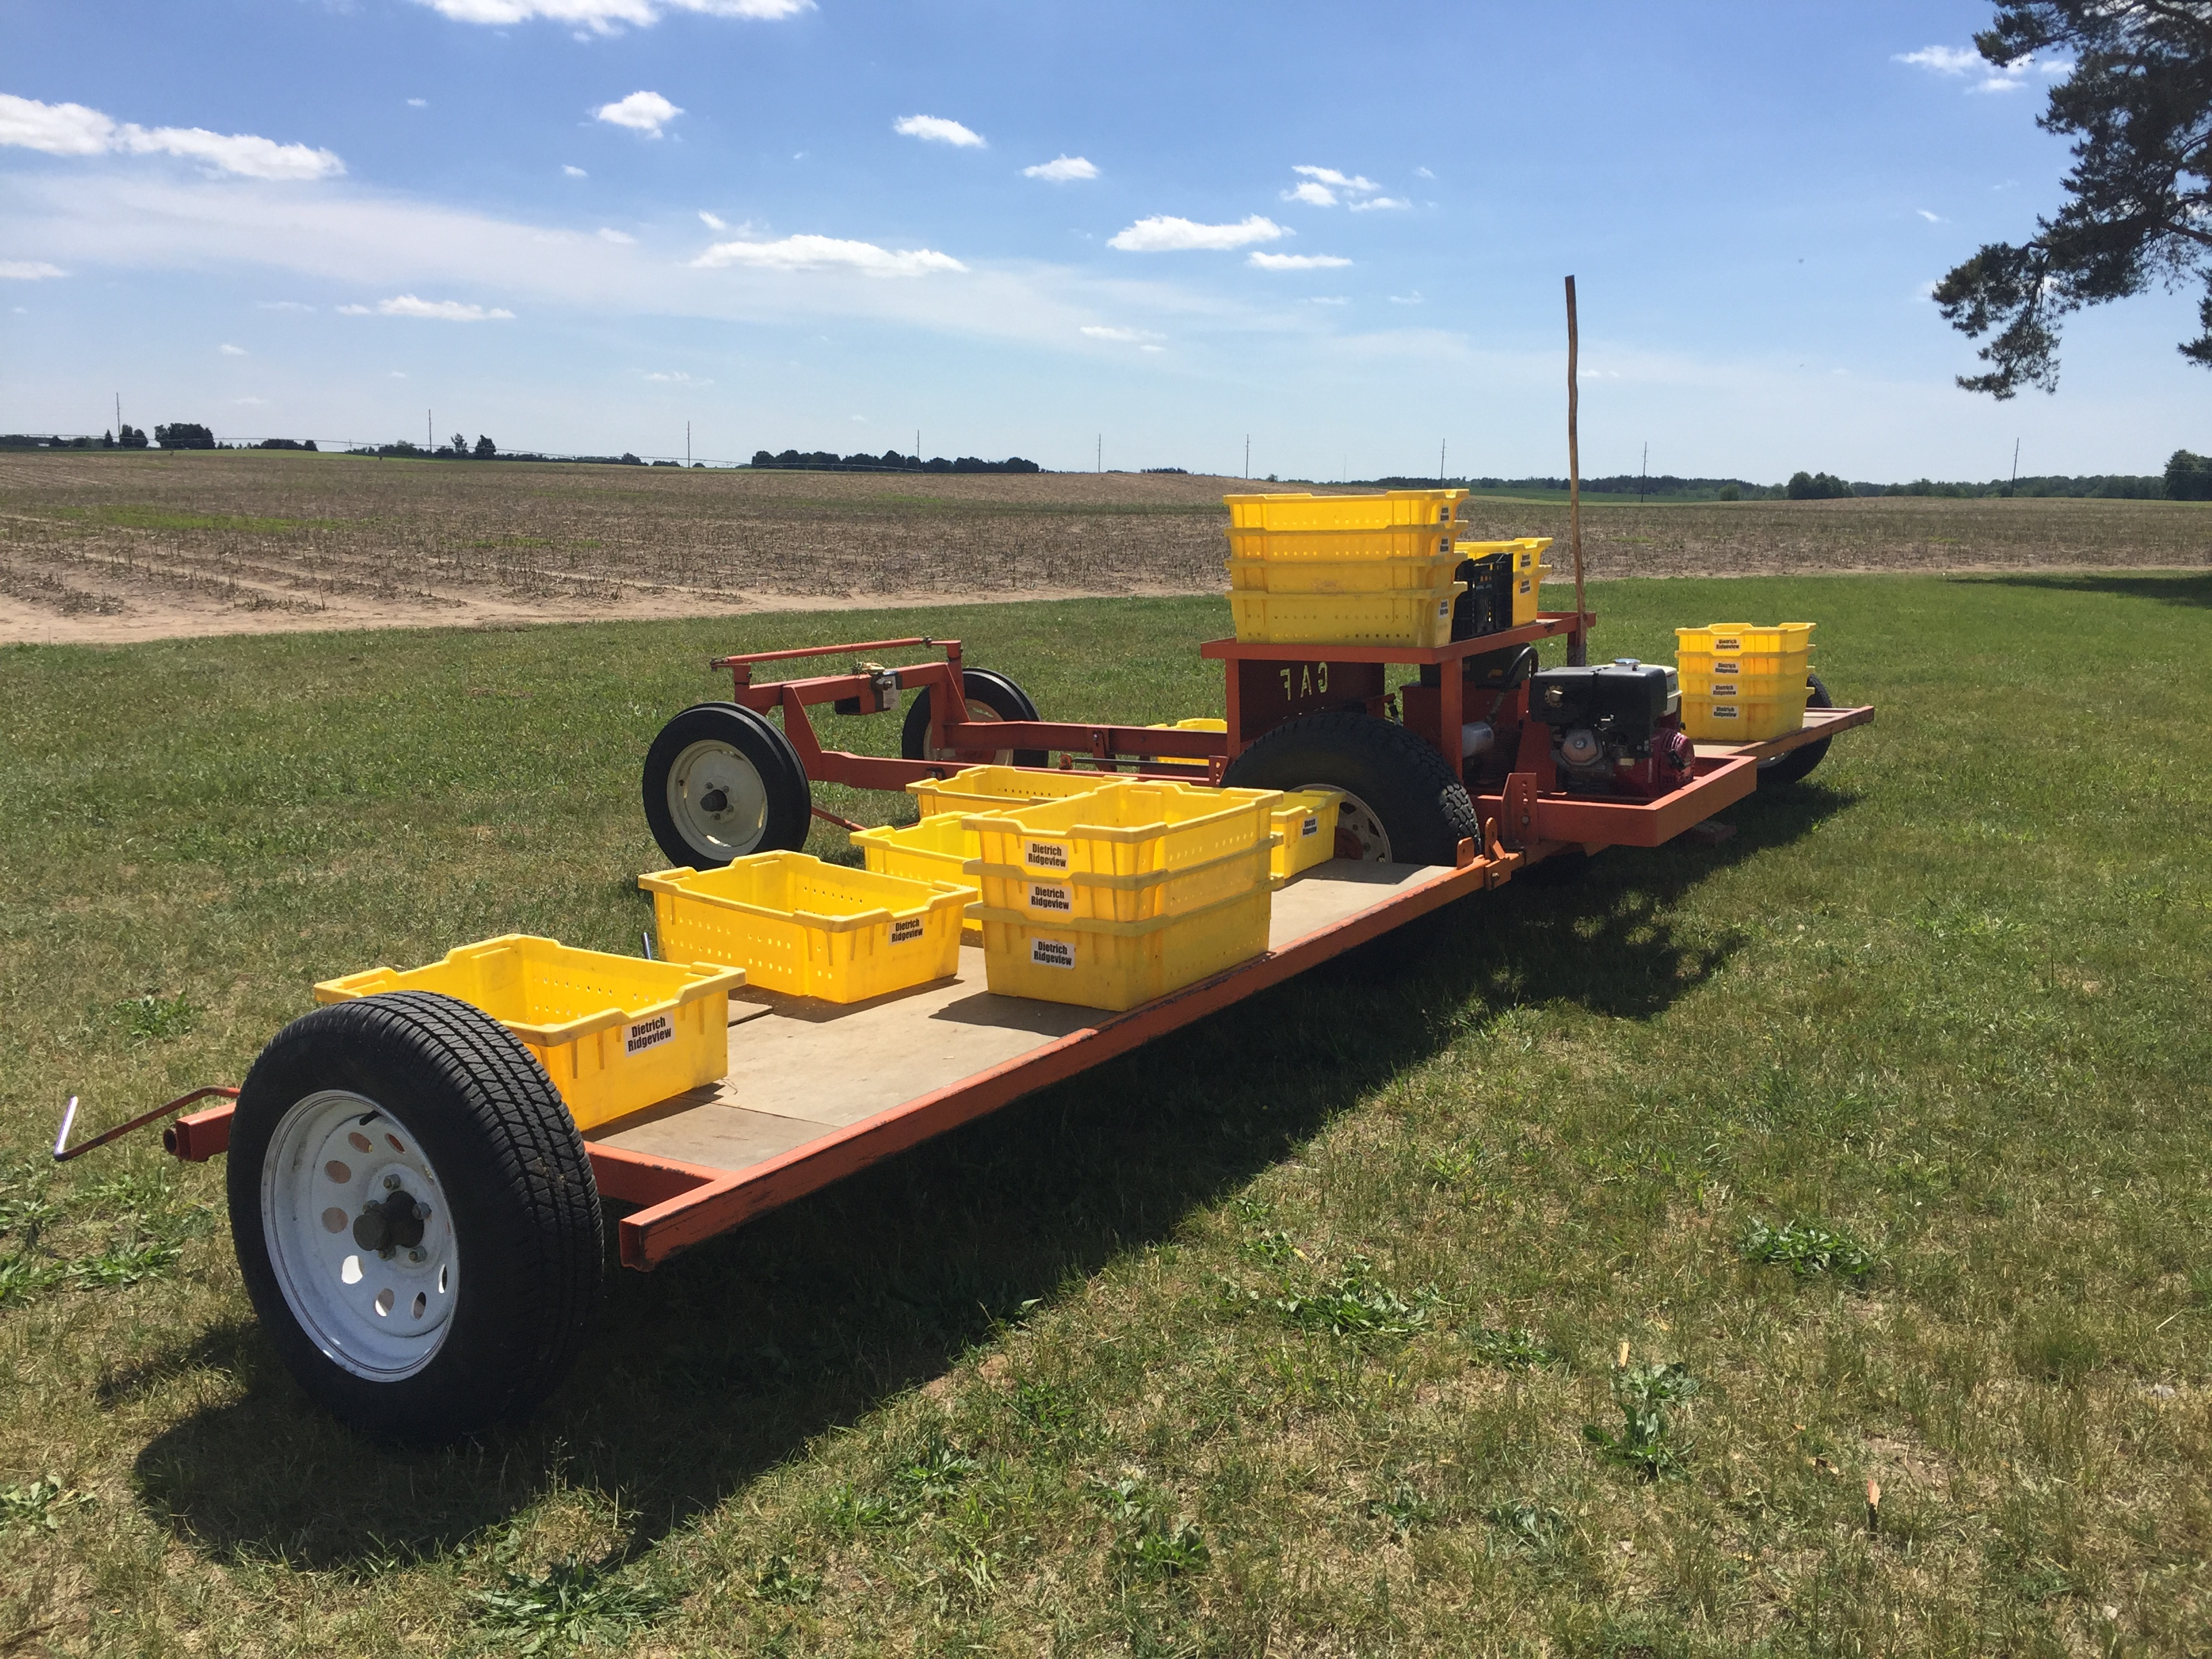 Asparagus tractor